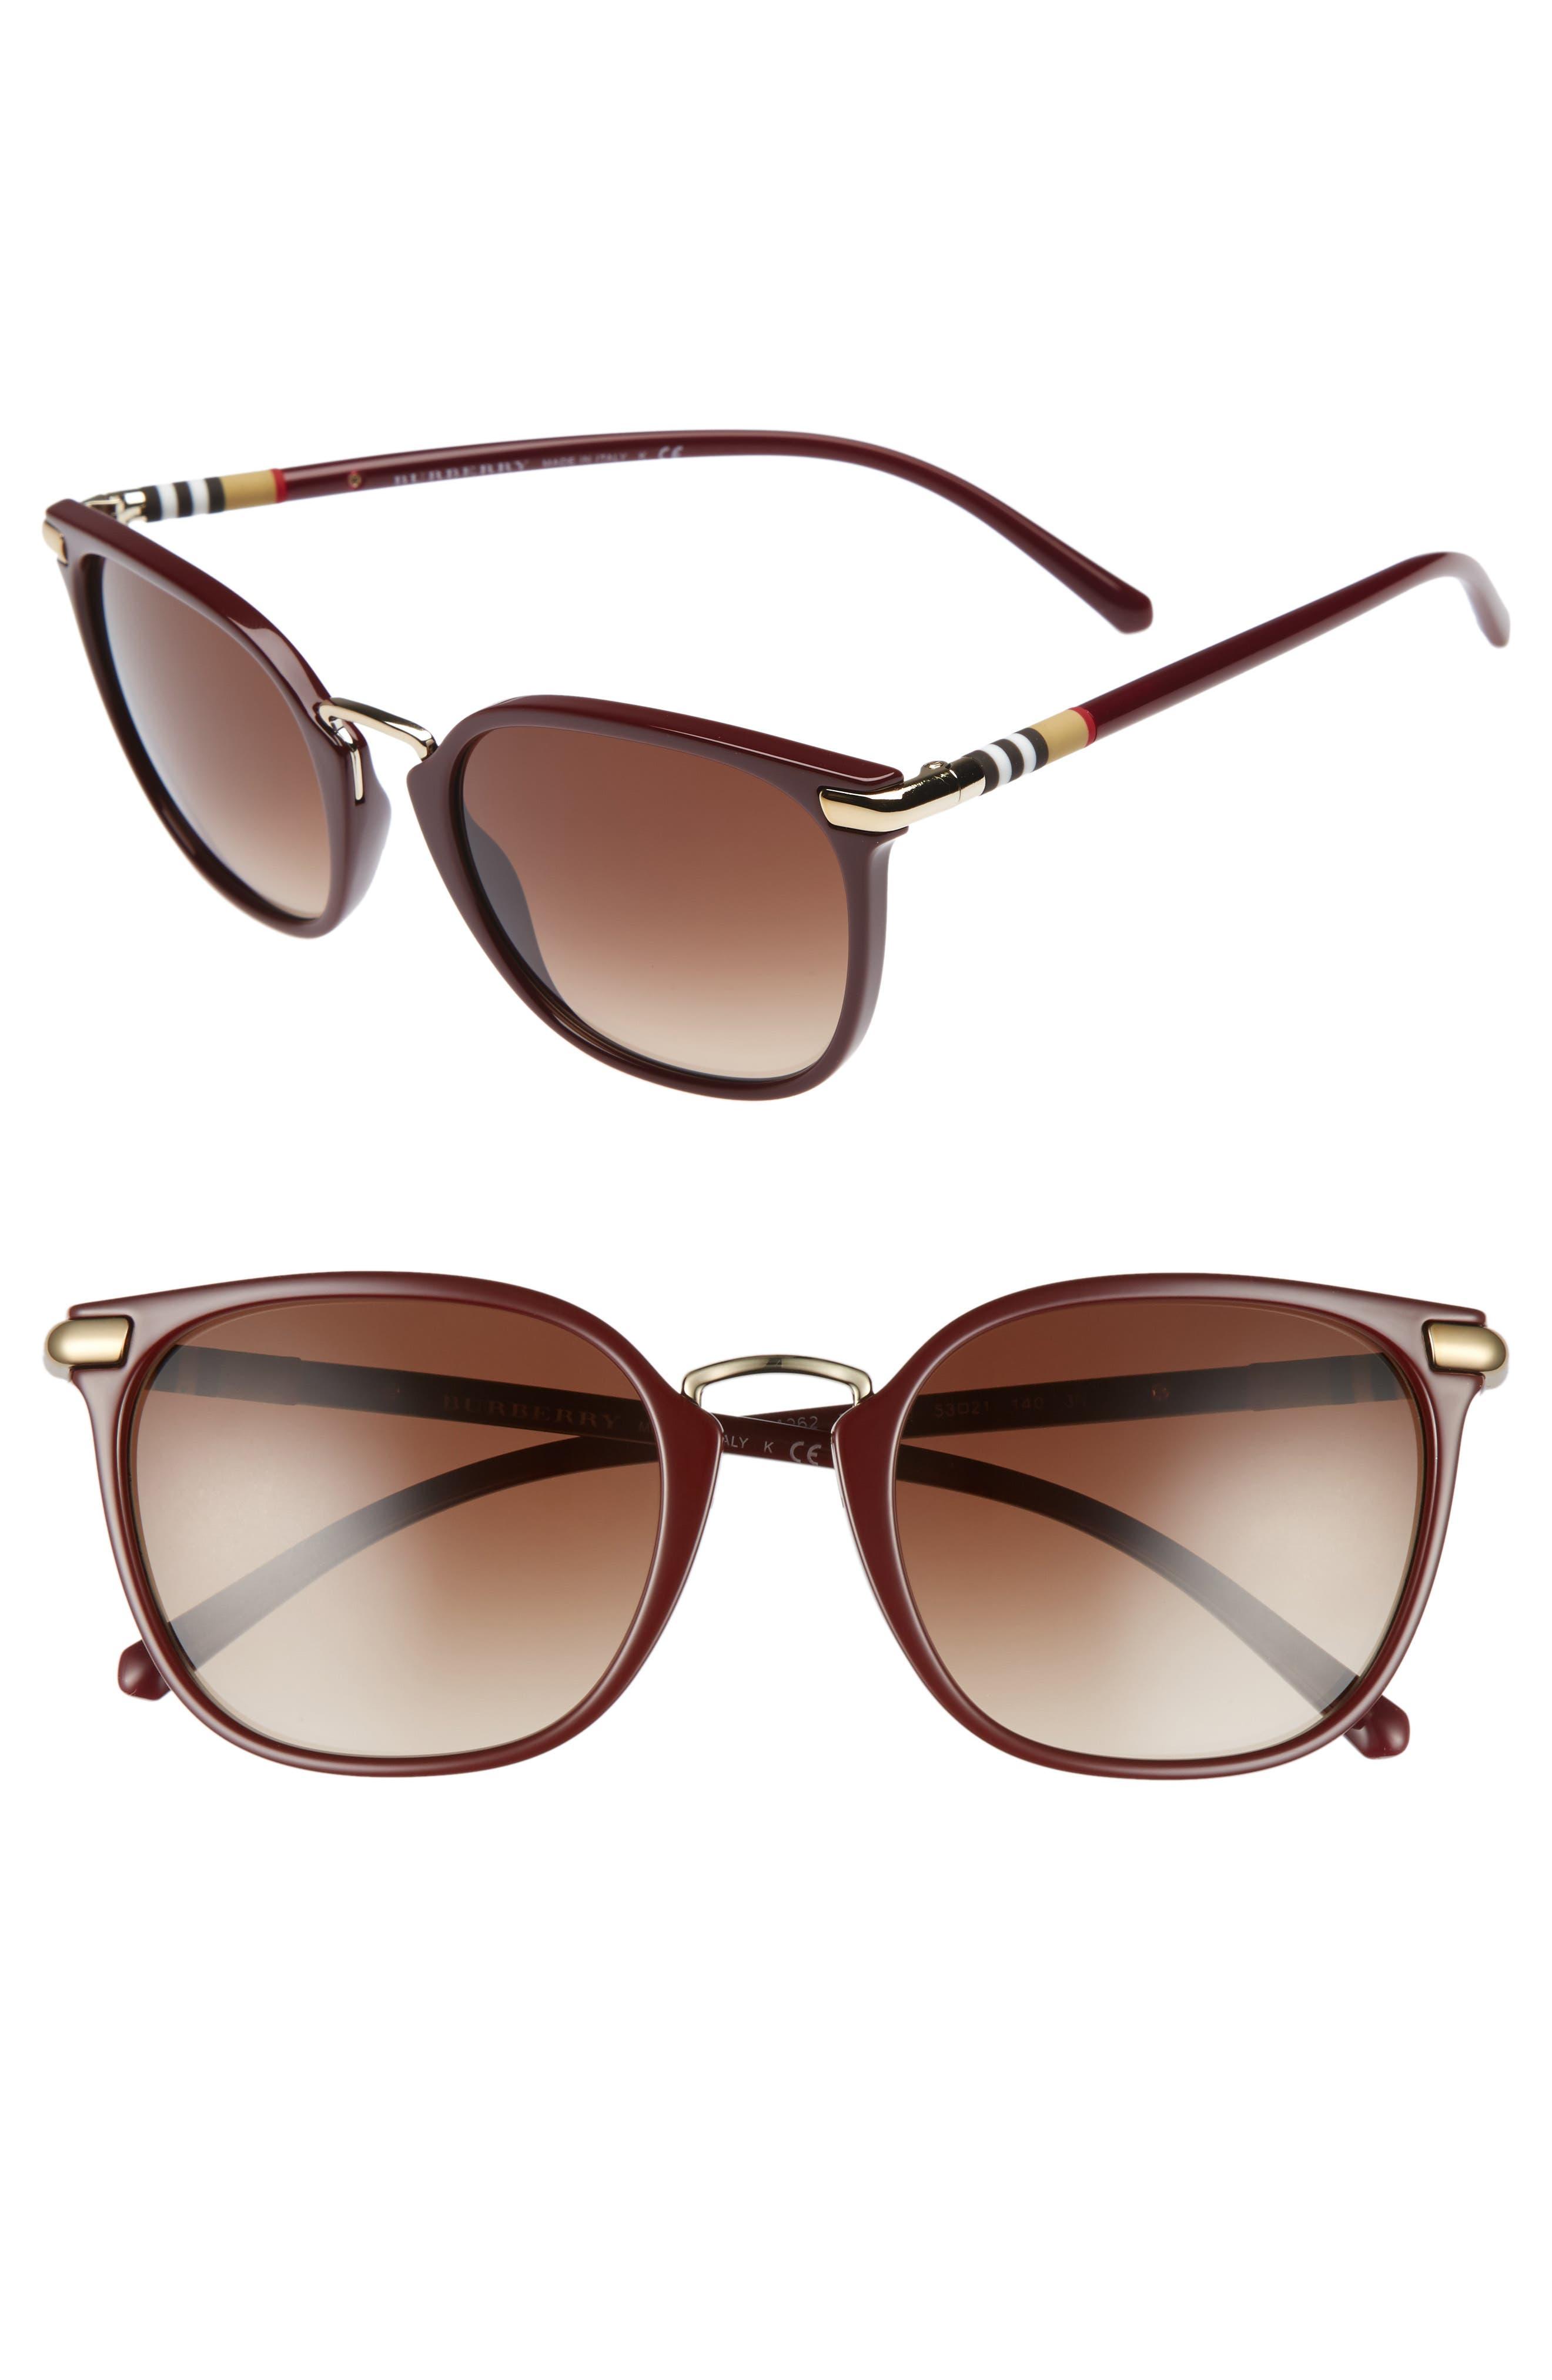 53mm Gradient Square Sunglasses,                             Main thumbnail 3, color,